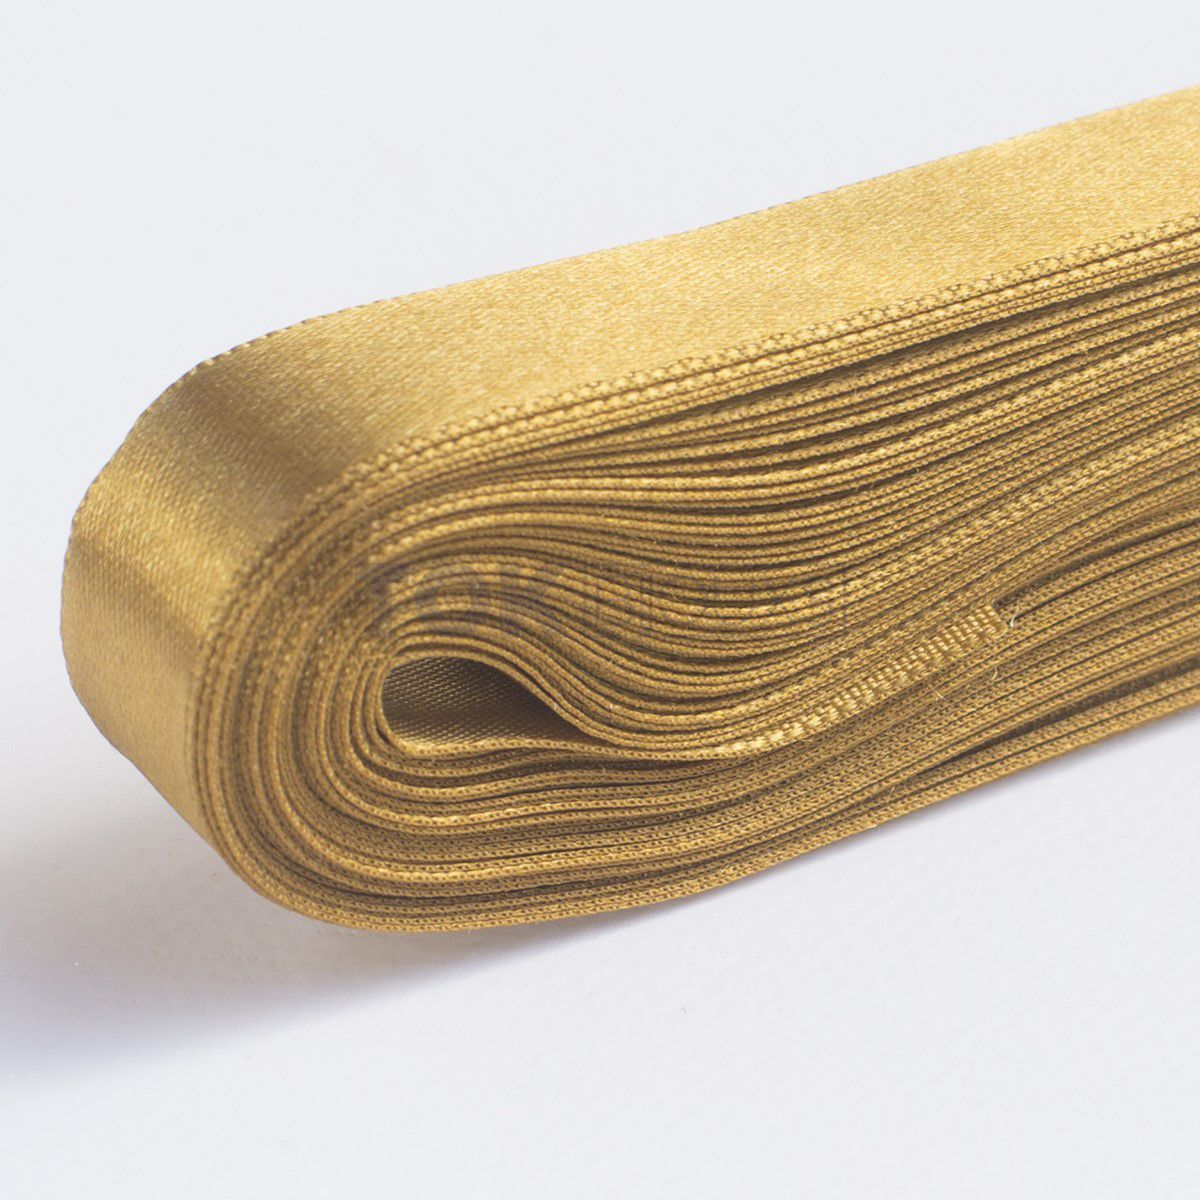 Fita Cetim N.1 - 7mm - 10 Metros - COR (47) Dourado